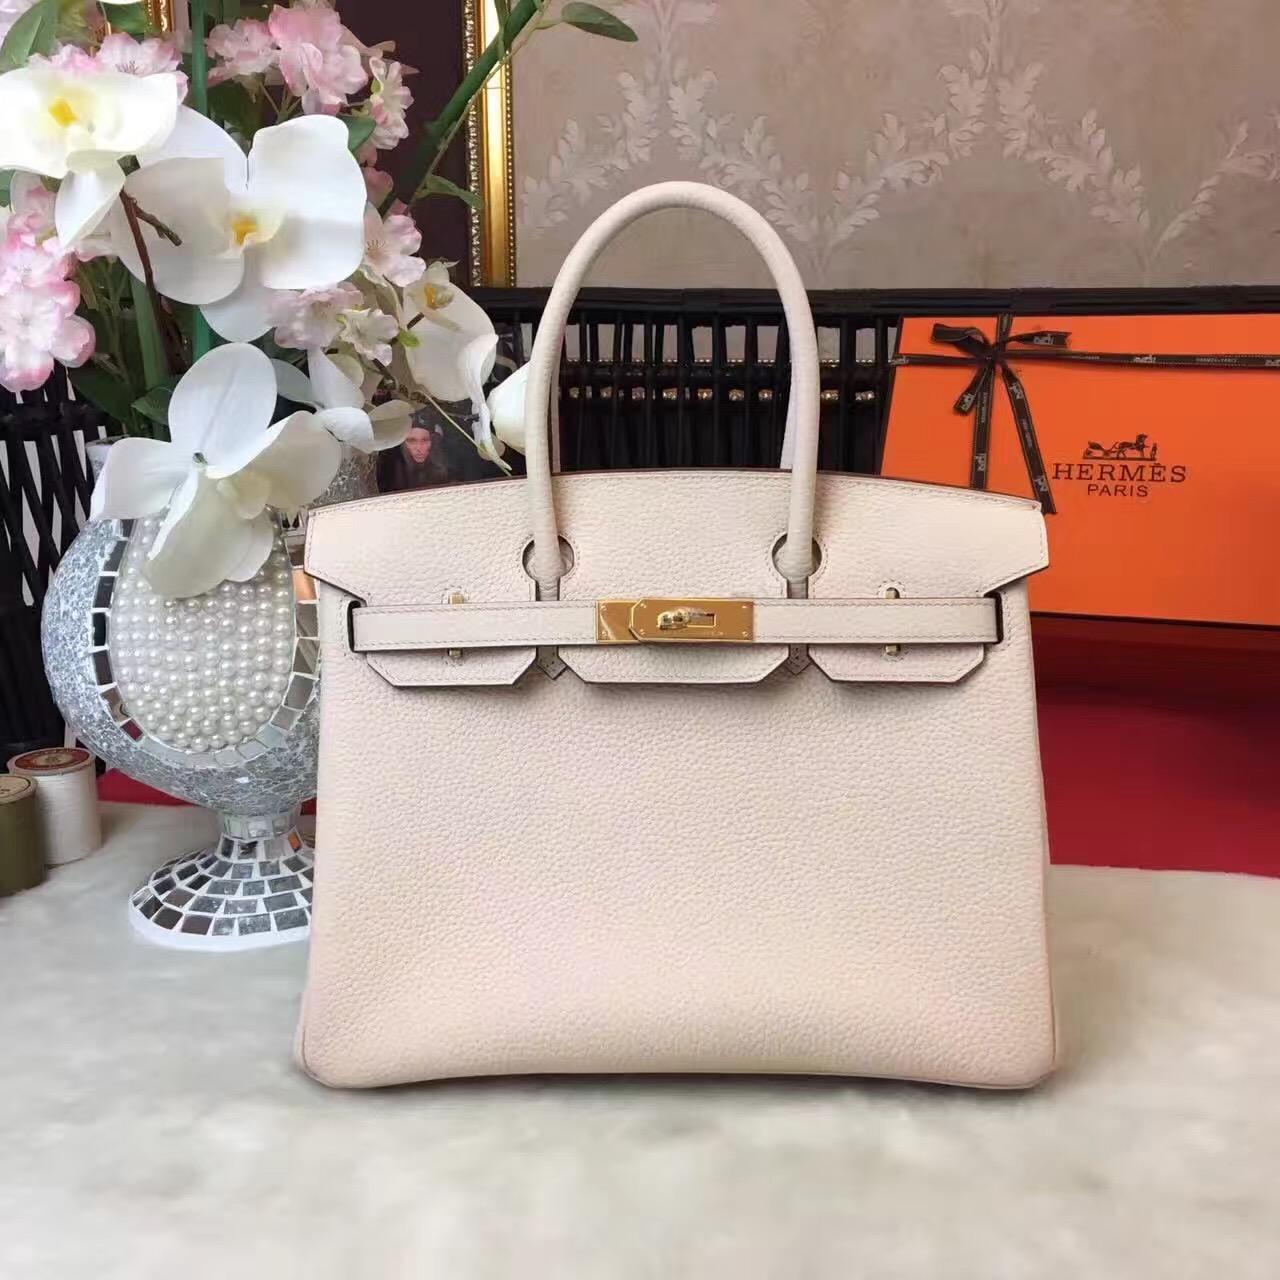 Hermes Top Leather Cream Birkin Handbags